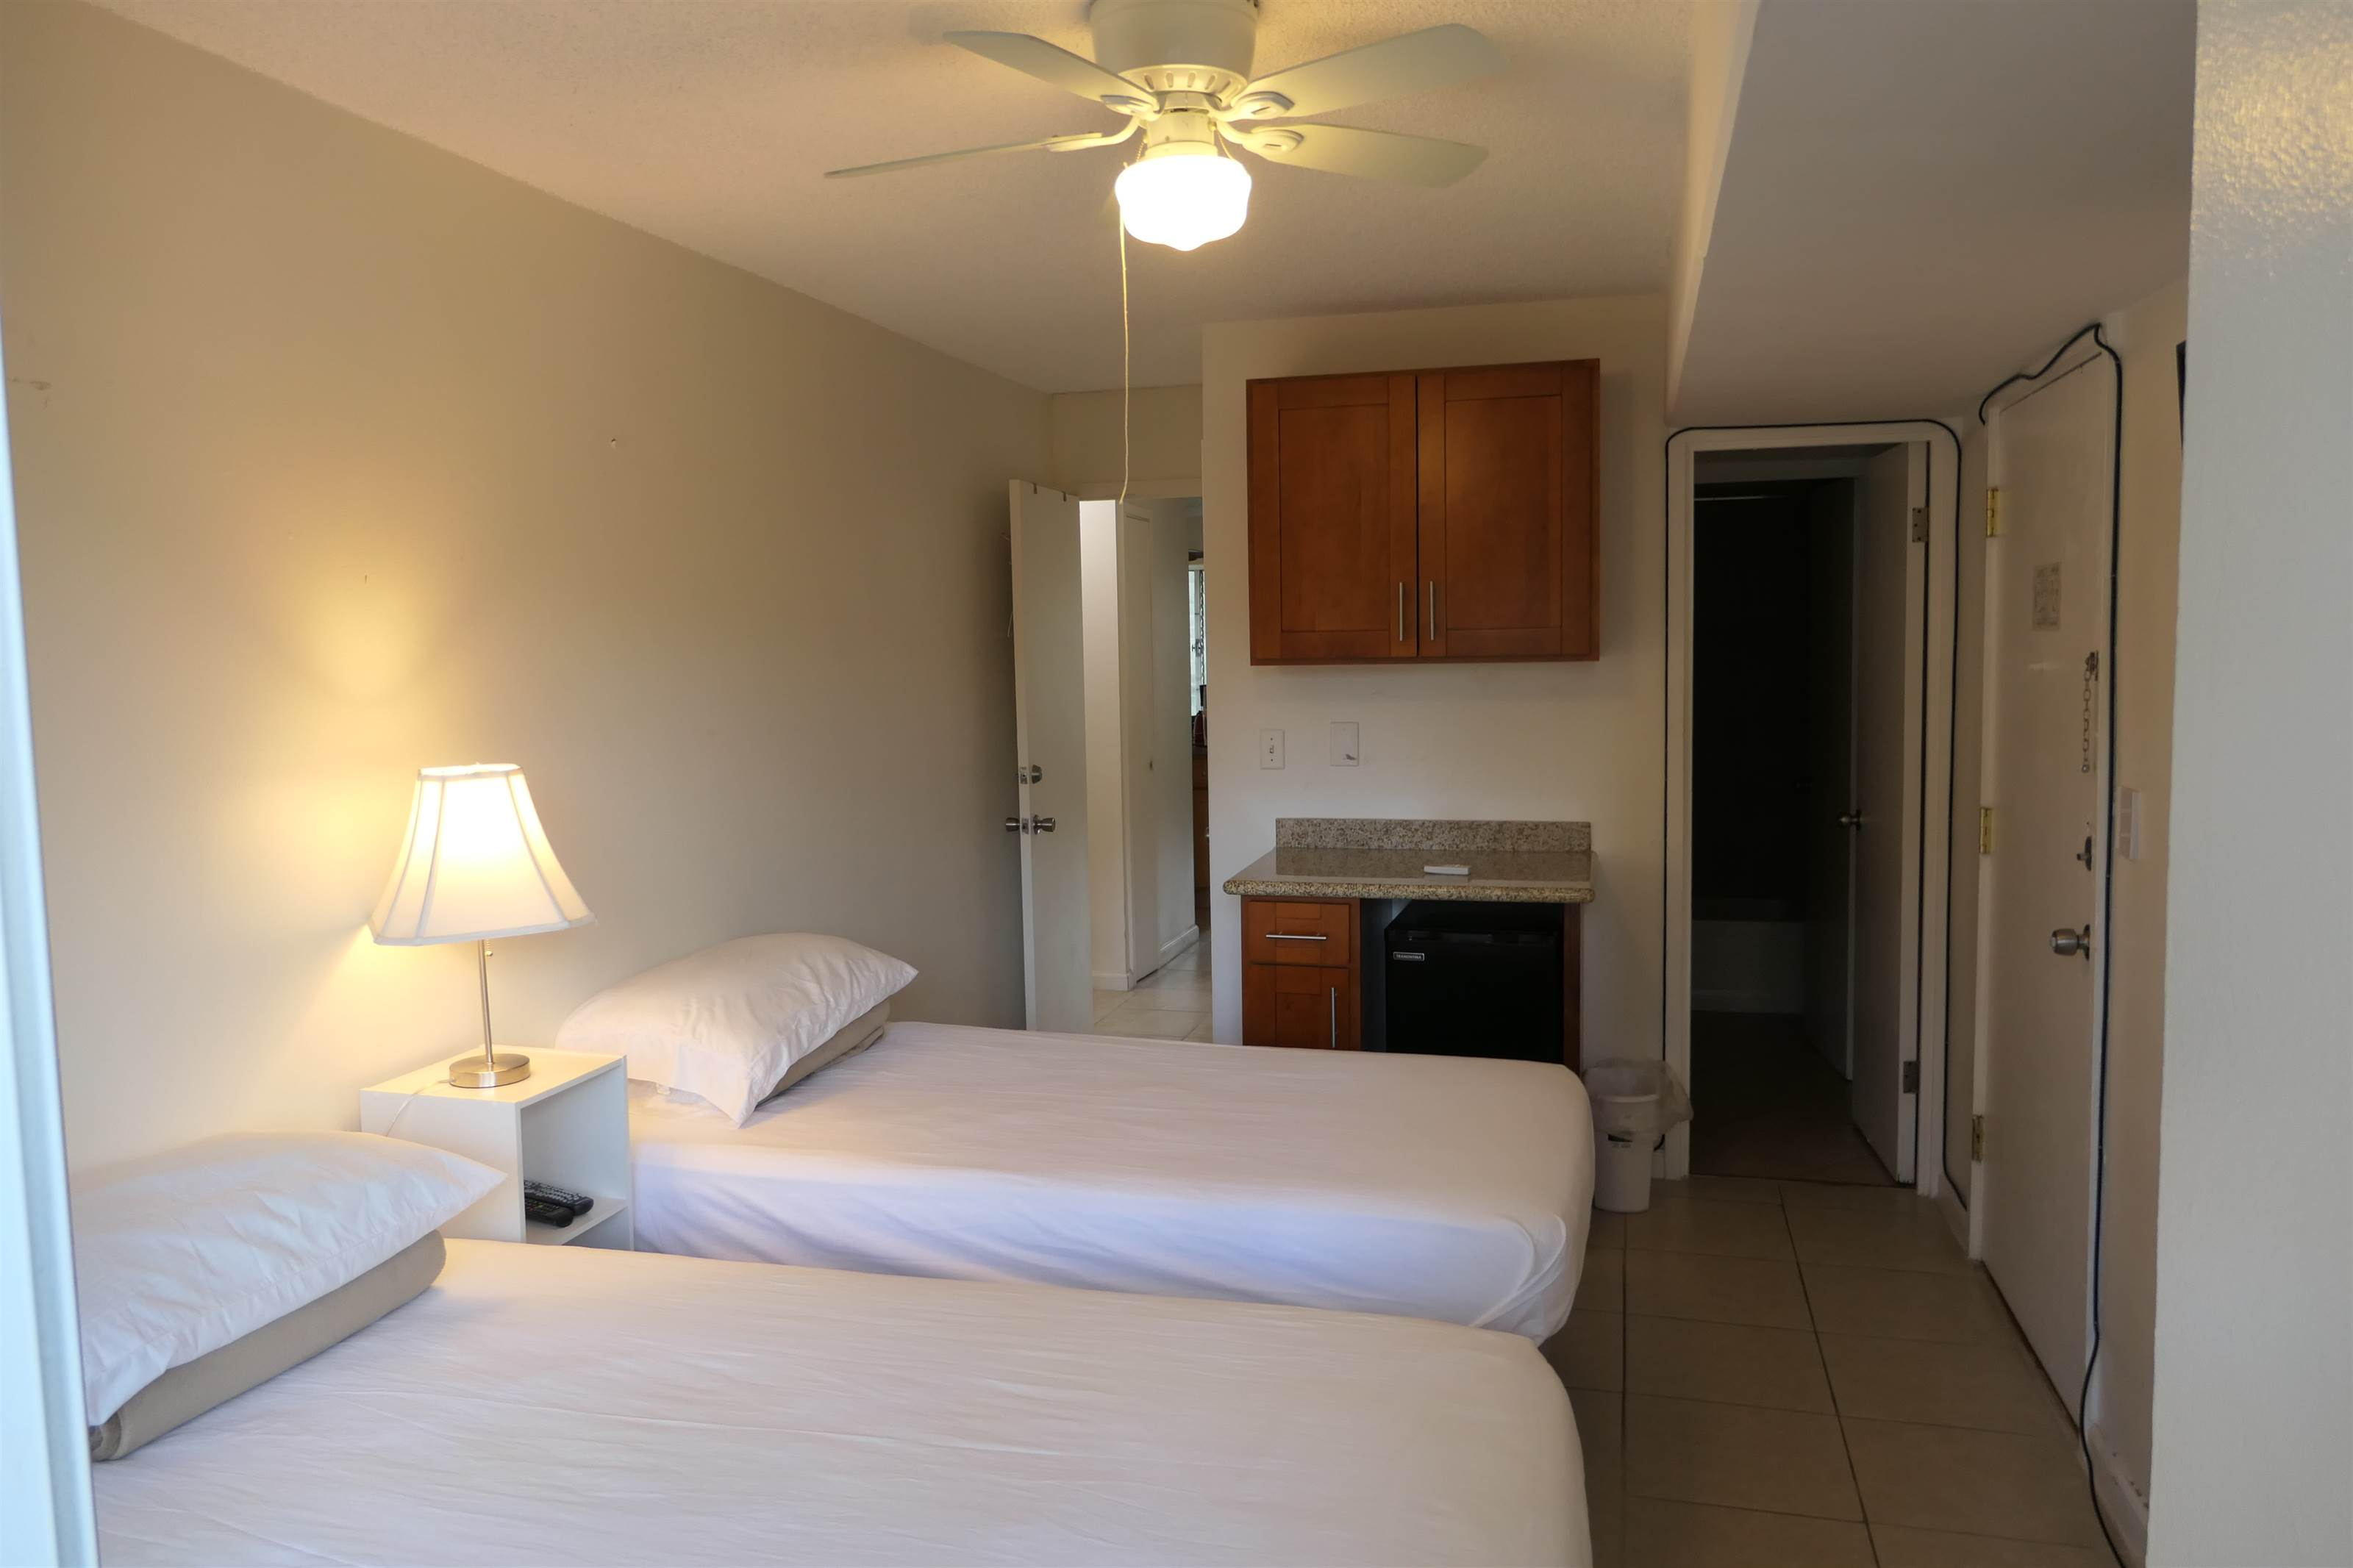 1690 Ala Moana Blvd #305, Honolulu, HI 96815